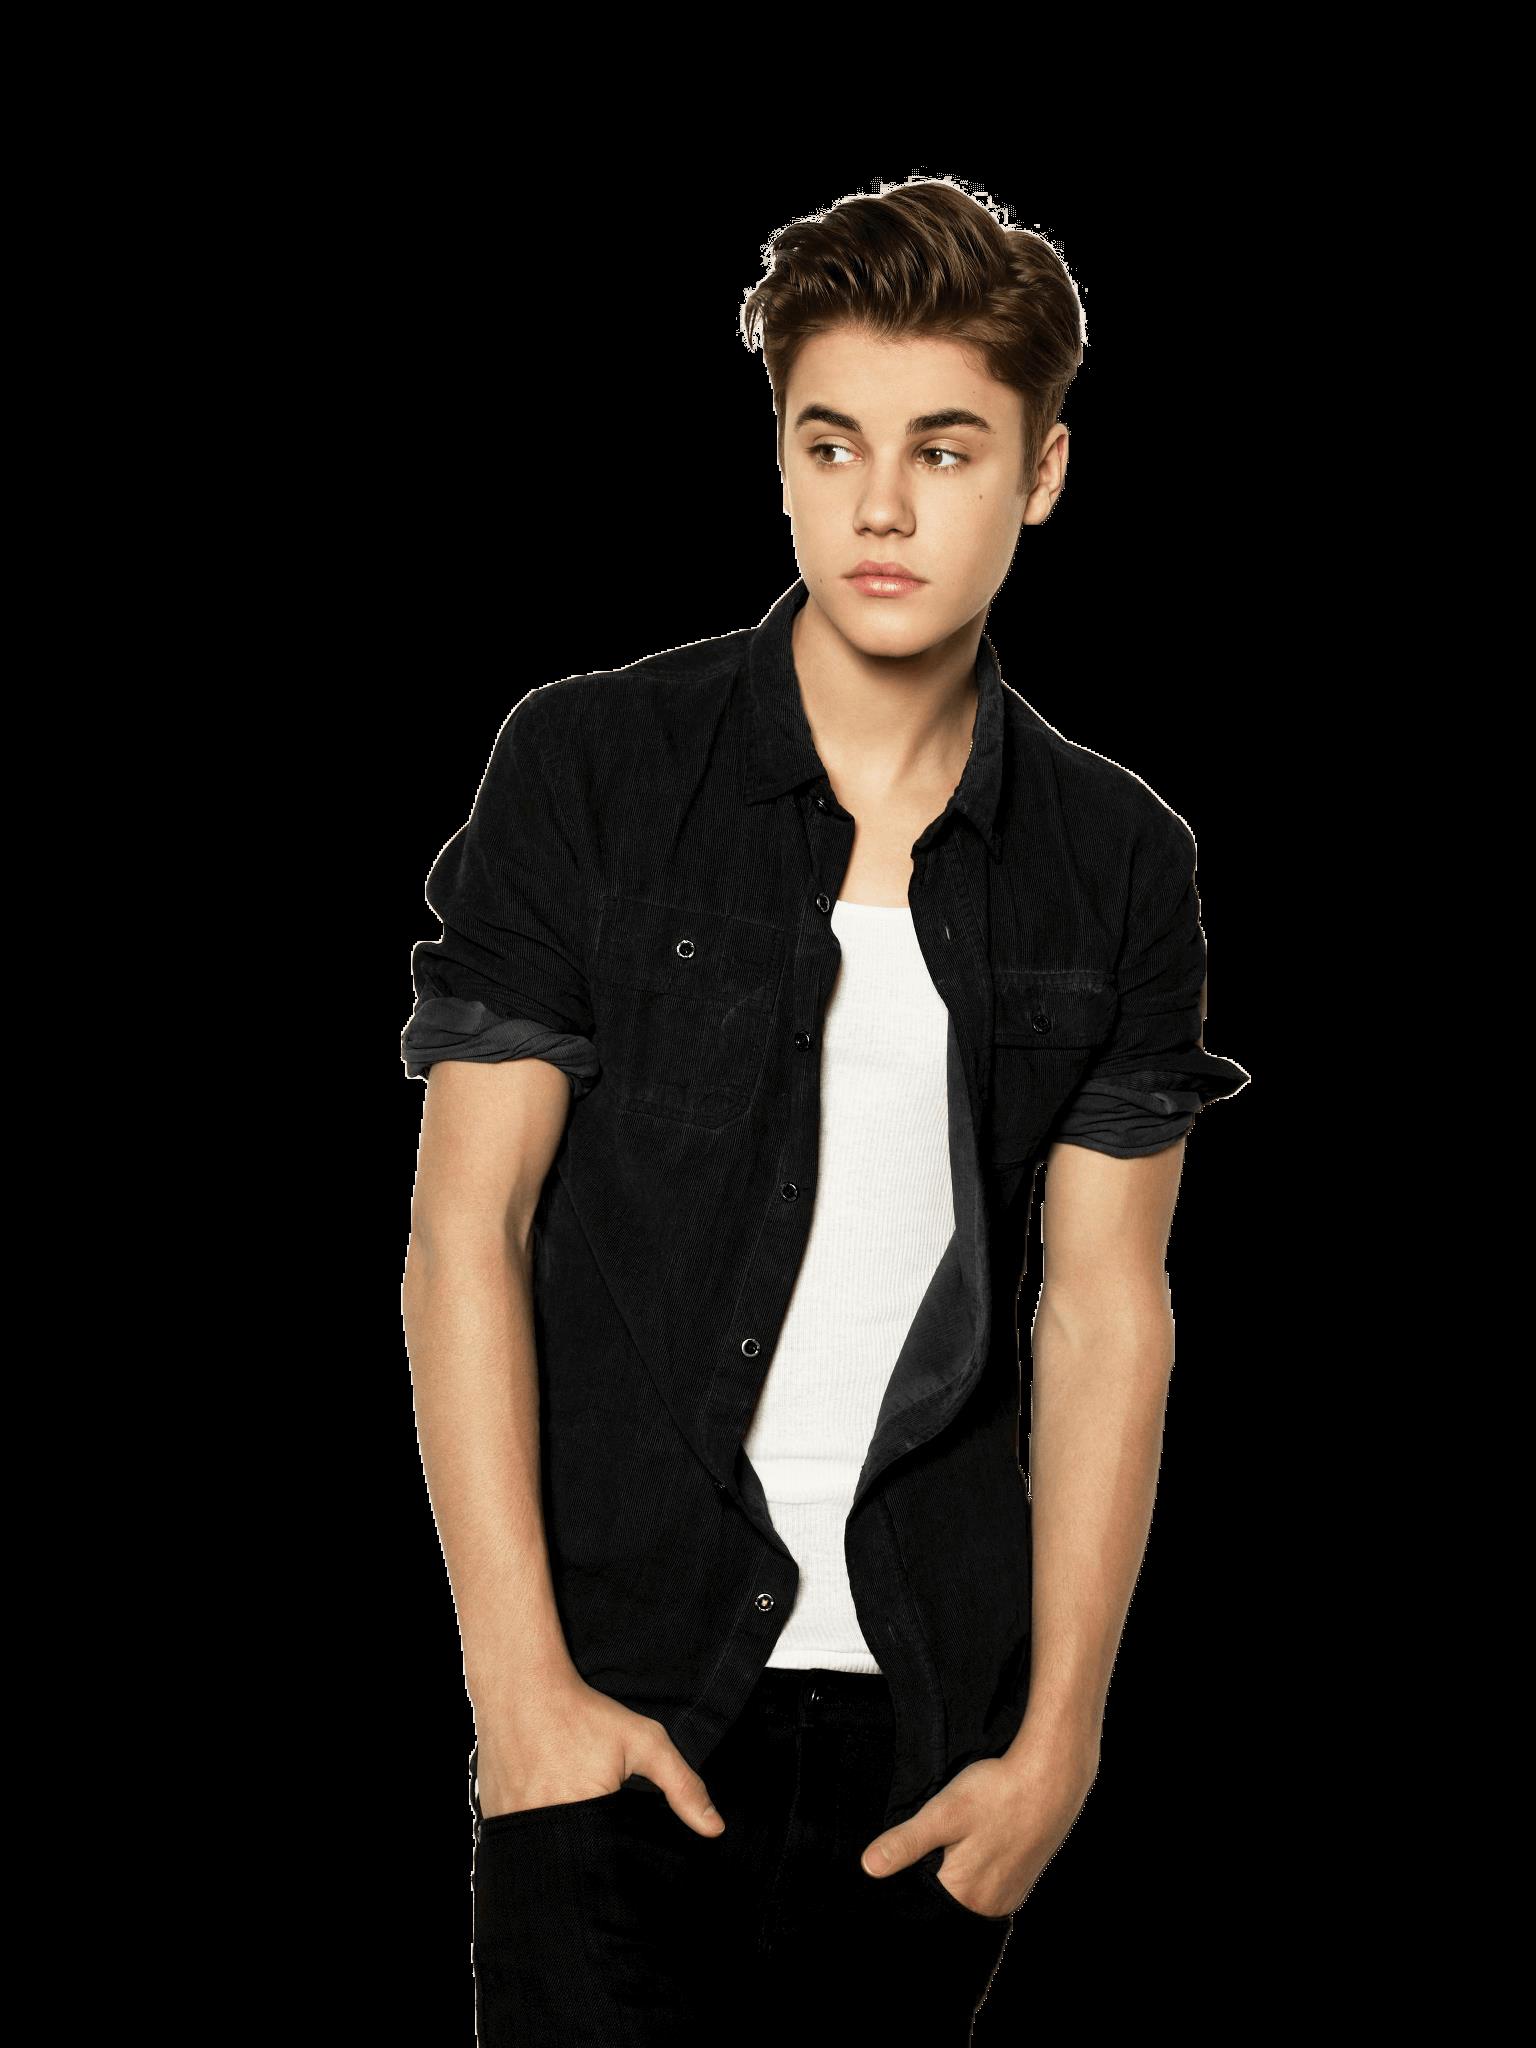 Standing Justin Bieber PNG Image.